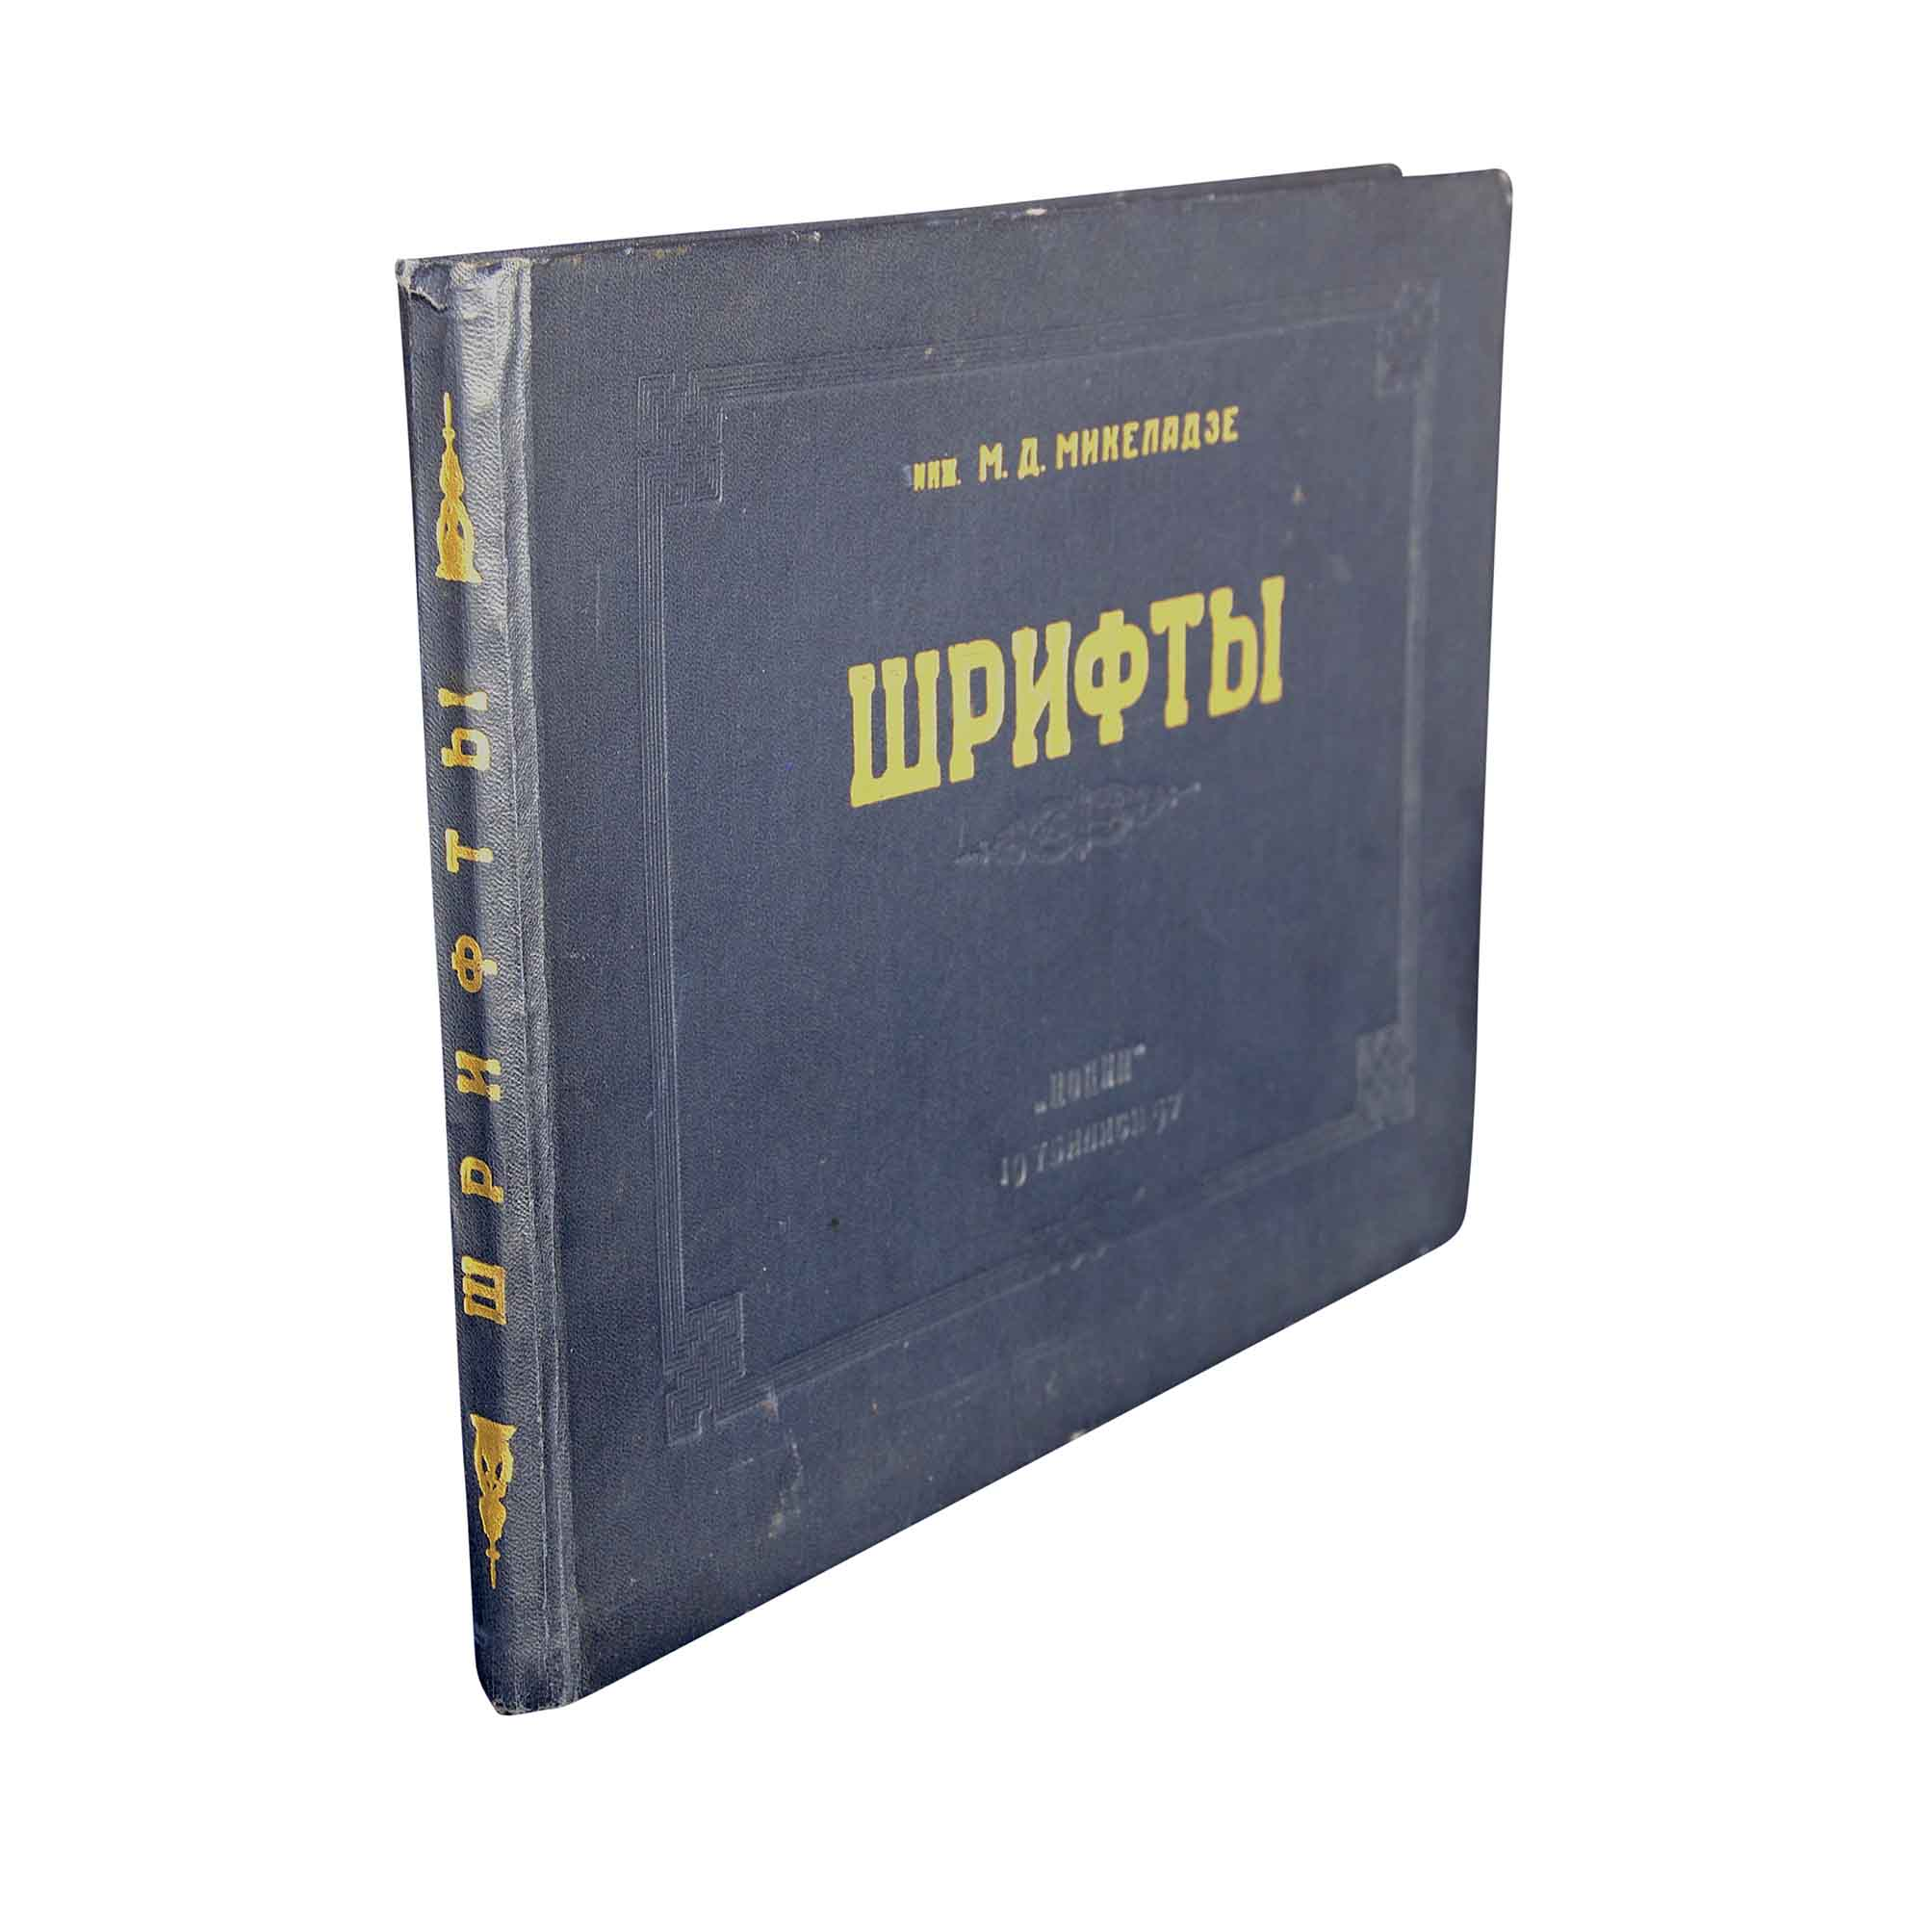 6087 Mikepadze Shrift Georgian Typography 1957 Cover N